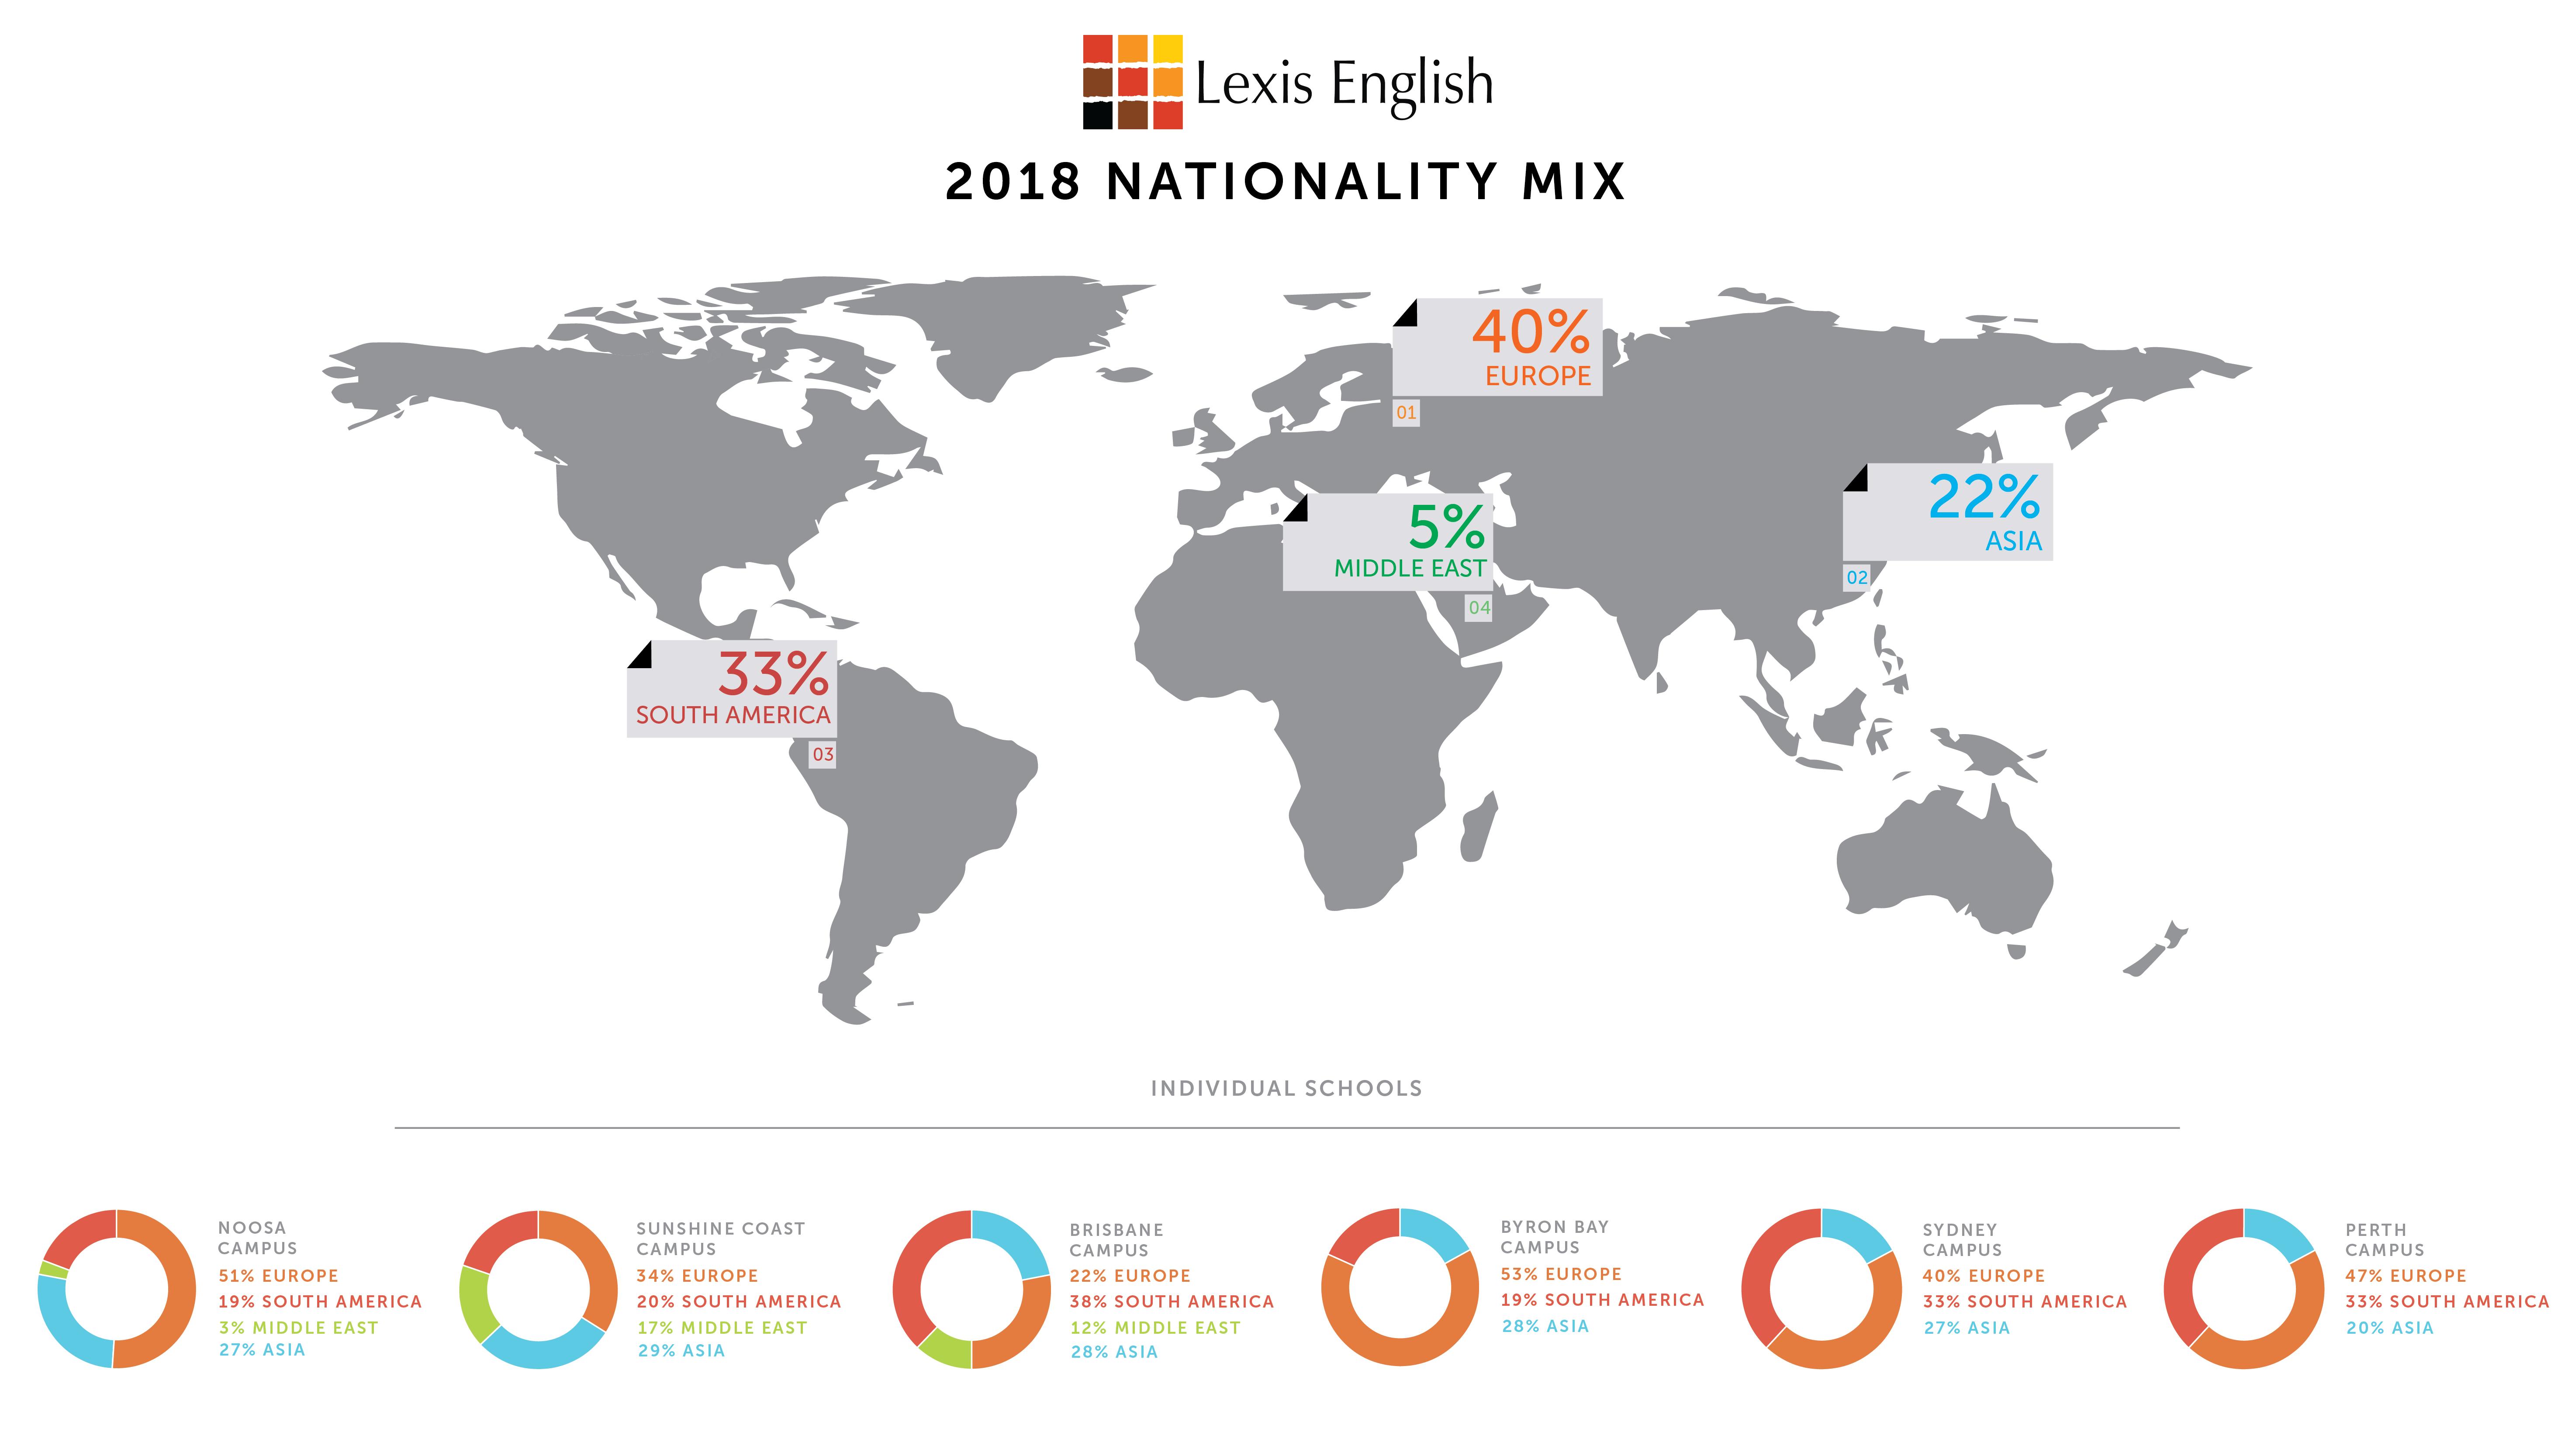 2018 Nationality Mix - Lexis English